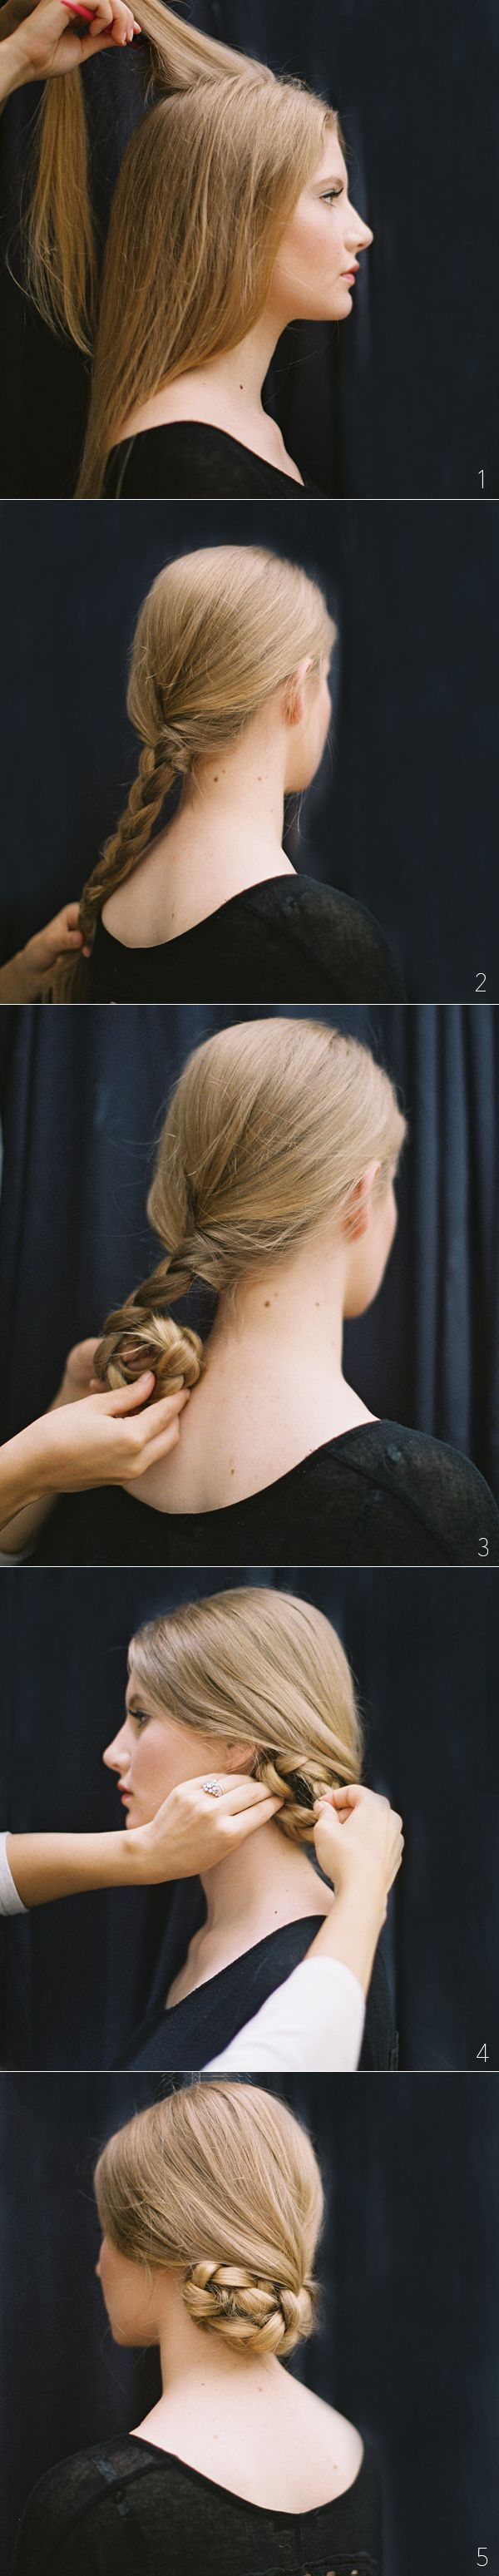 Tucked Braided Bun Hairstyles for Long Hair via oncewed.com